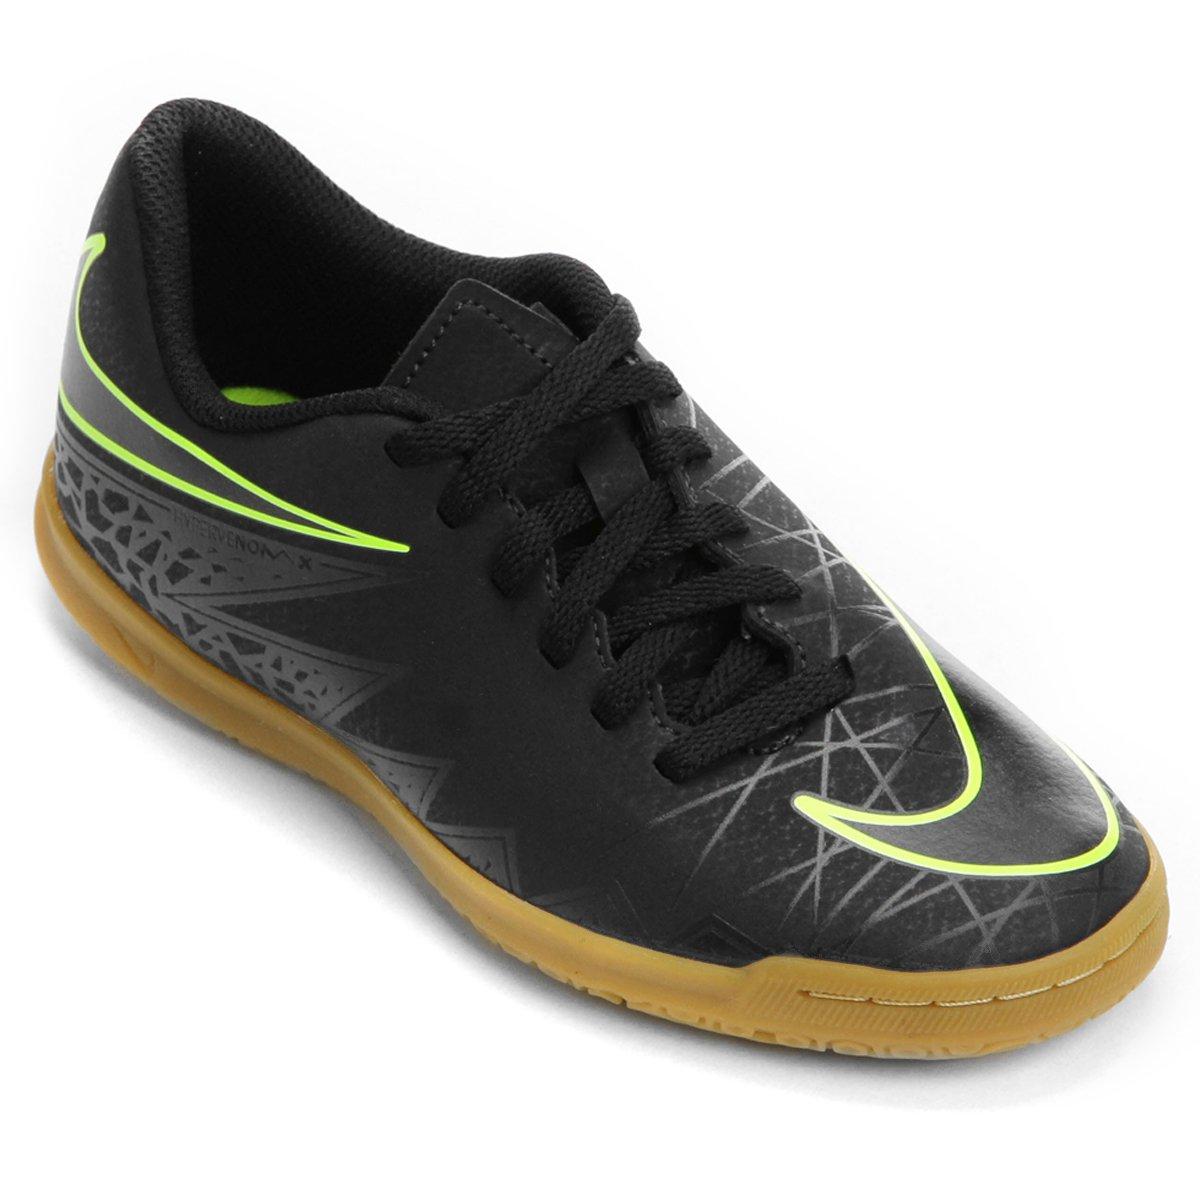 fa13f8c9ea043 ... hot chuteira futsal infantil nike hypervenom phade 2 ic compre agora  netshoes 1c173 6c03a